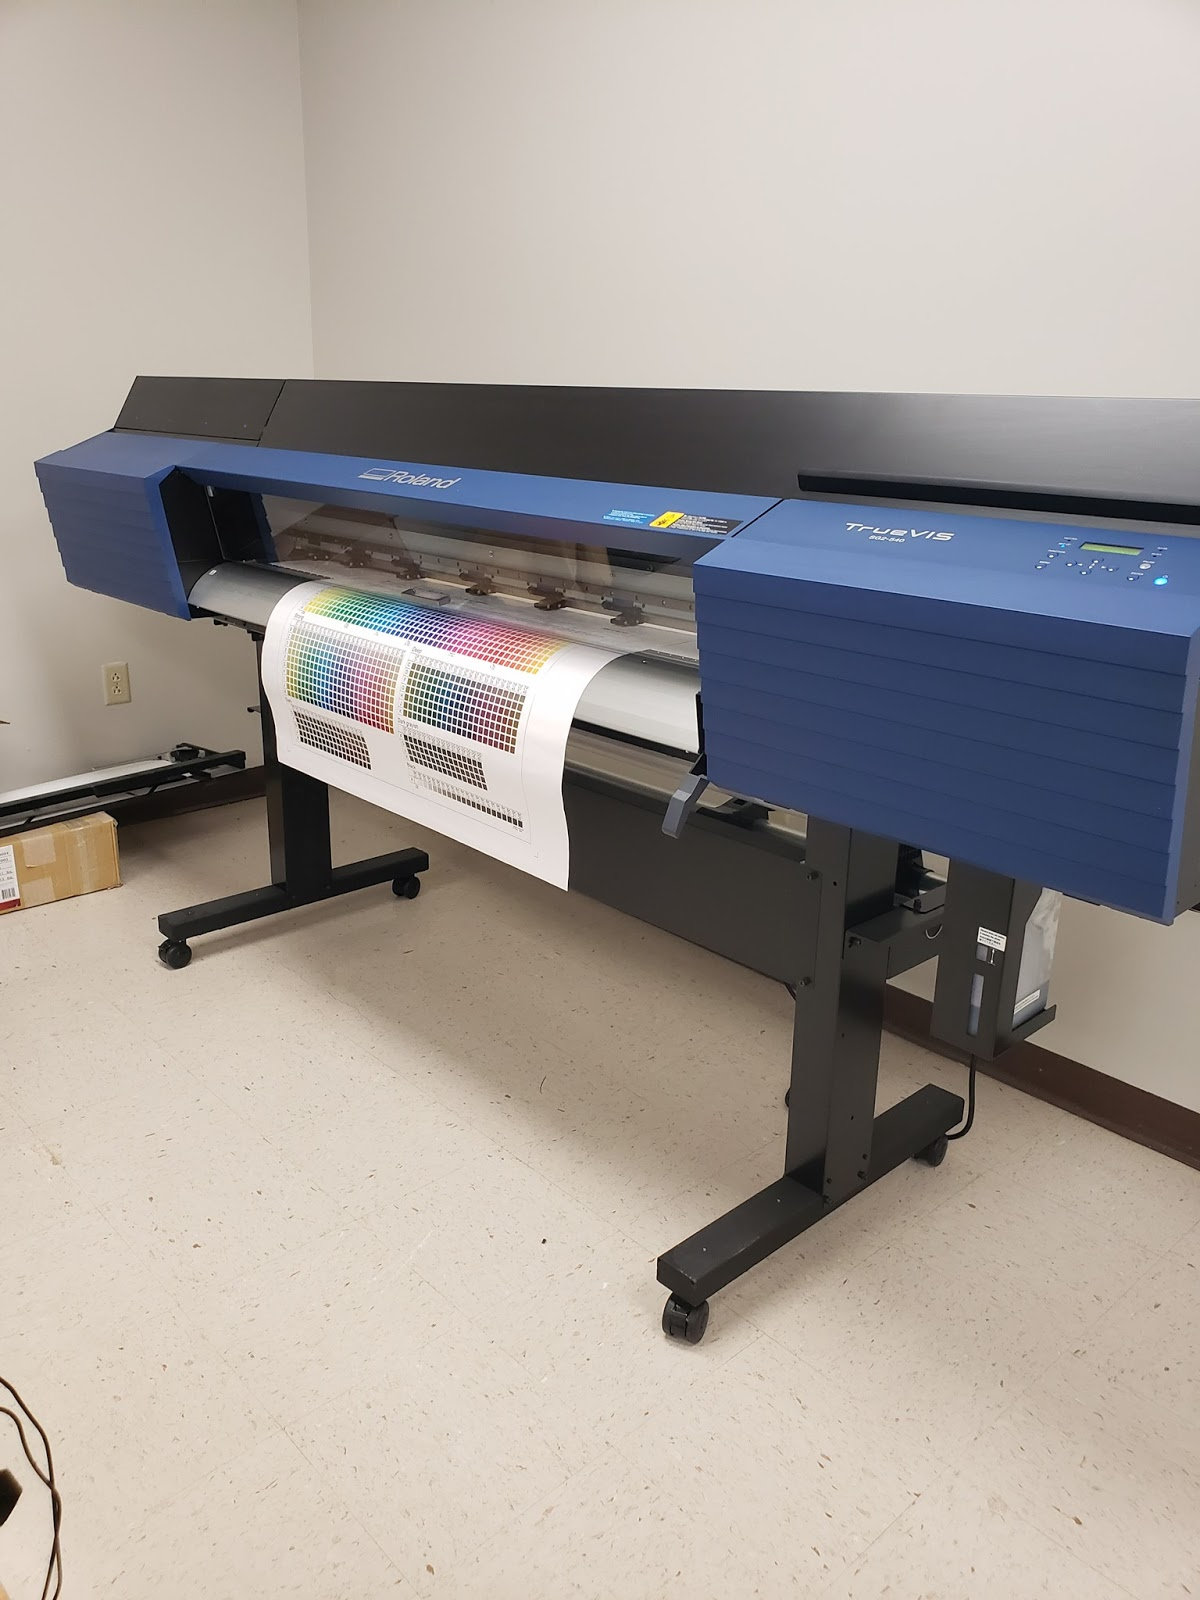 Roland Large Format Printer Cutter